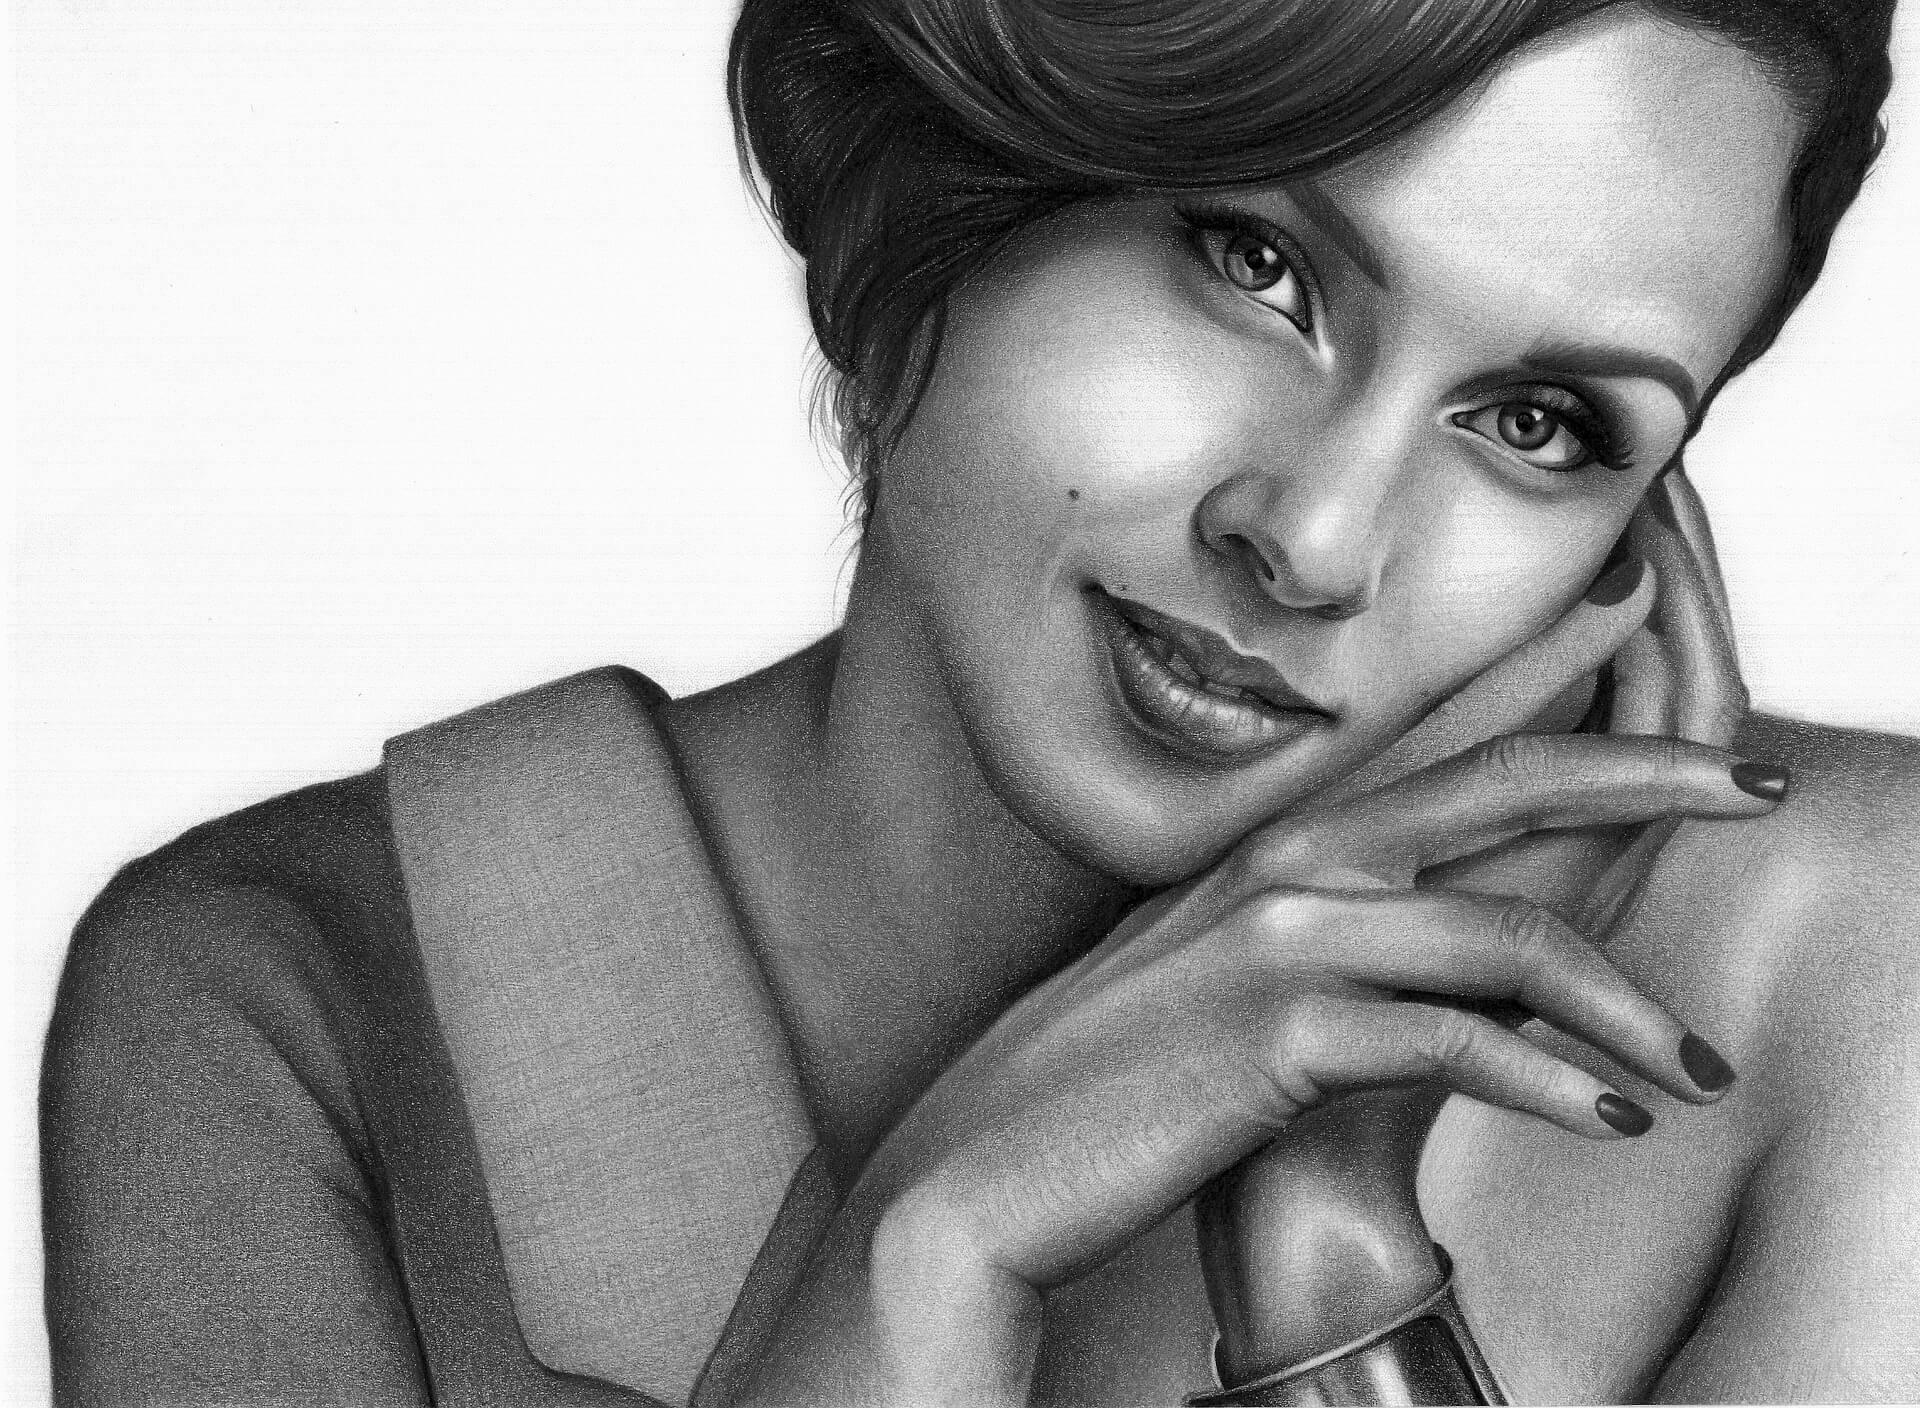 női grafit portré rajz